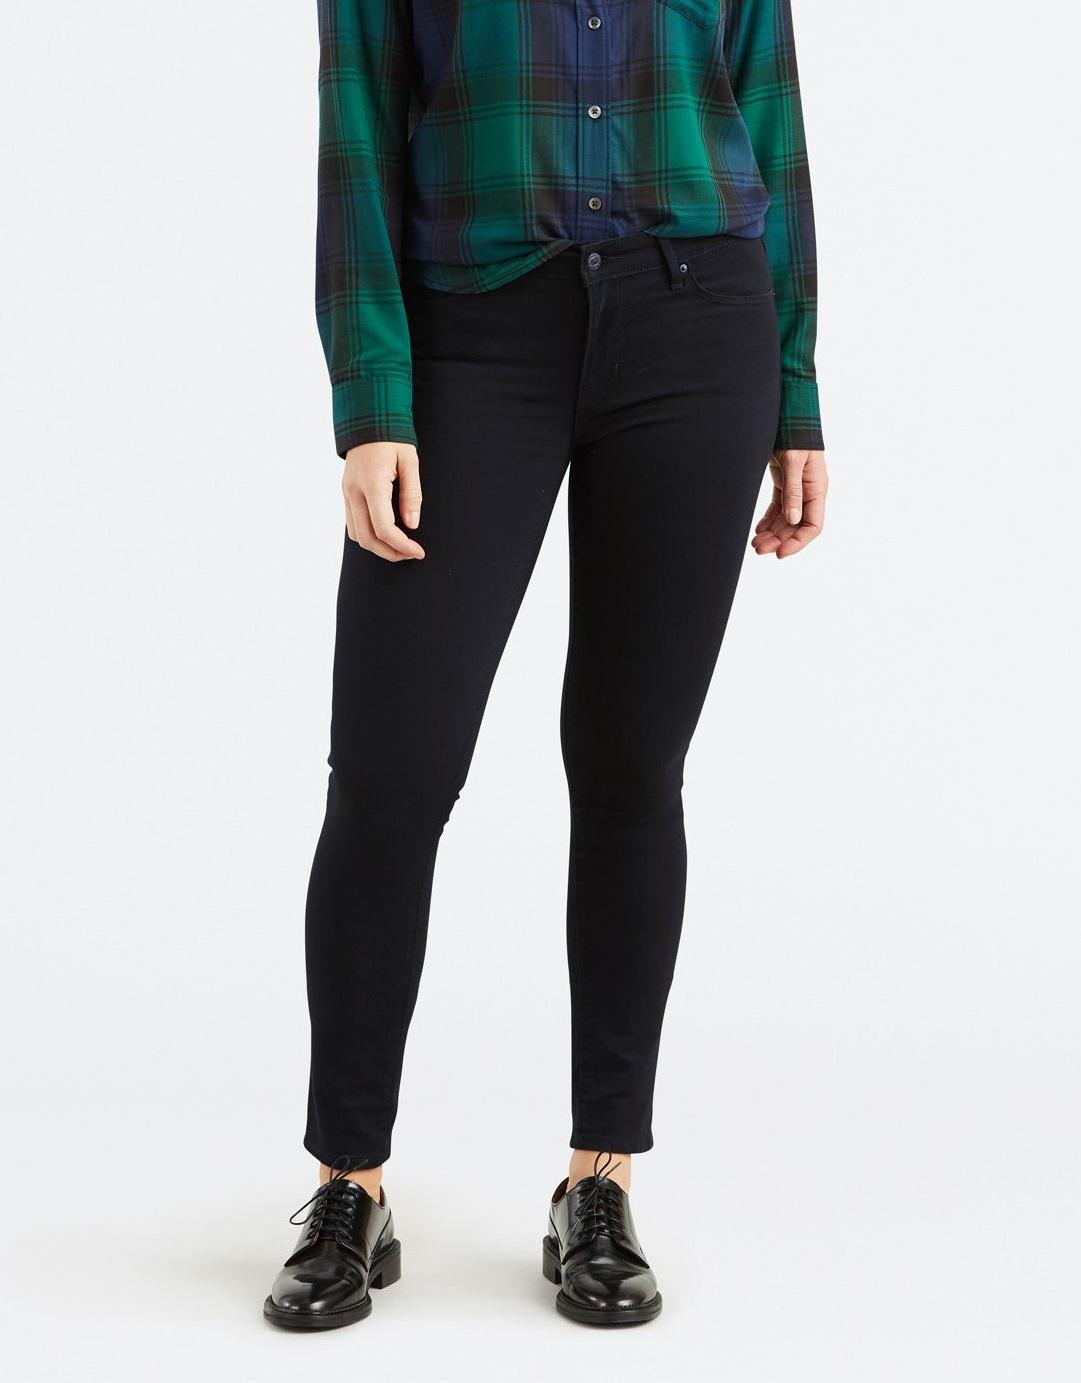 levi's, skinny jeans, black jeans